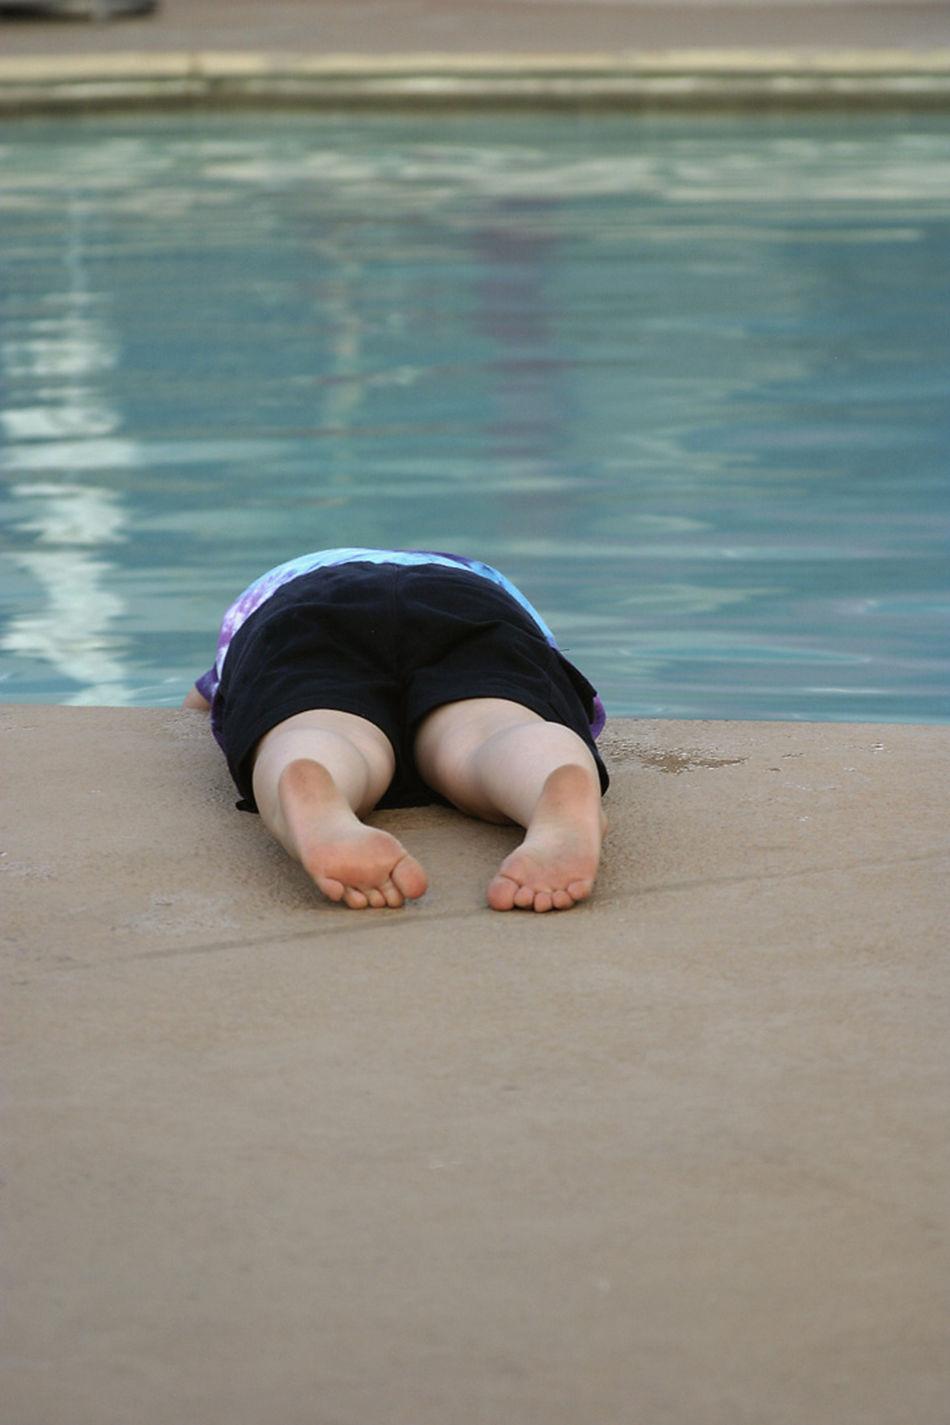 Kid Childsplay Children Swimming Pool Falling Down Laying Down Flat Out